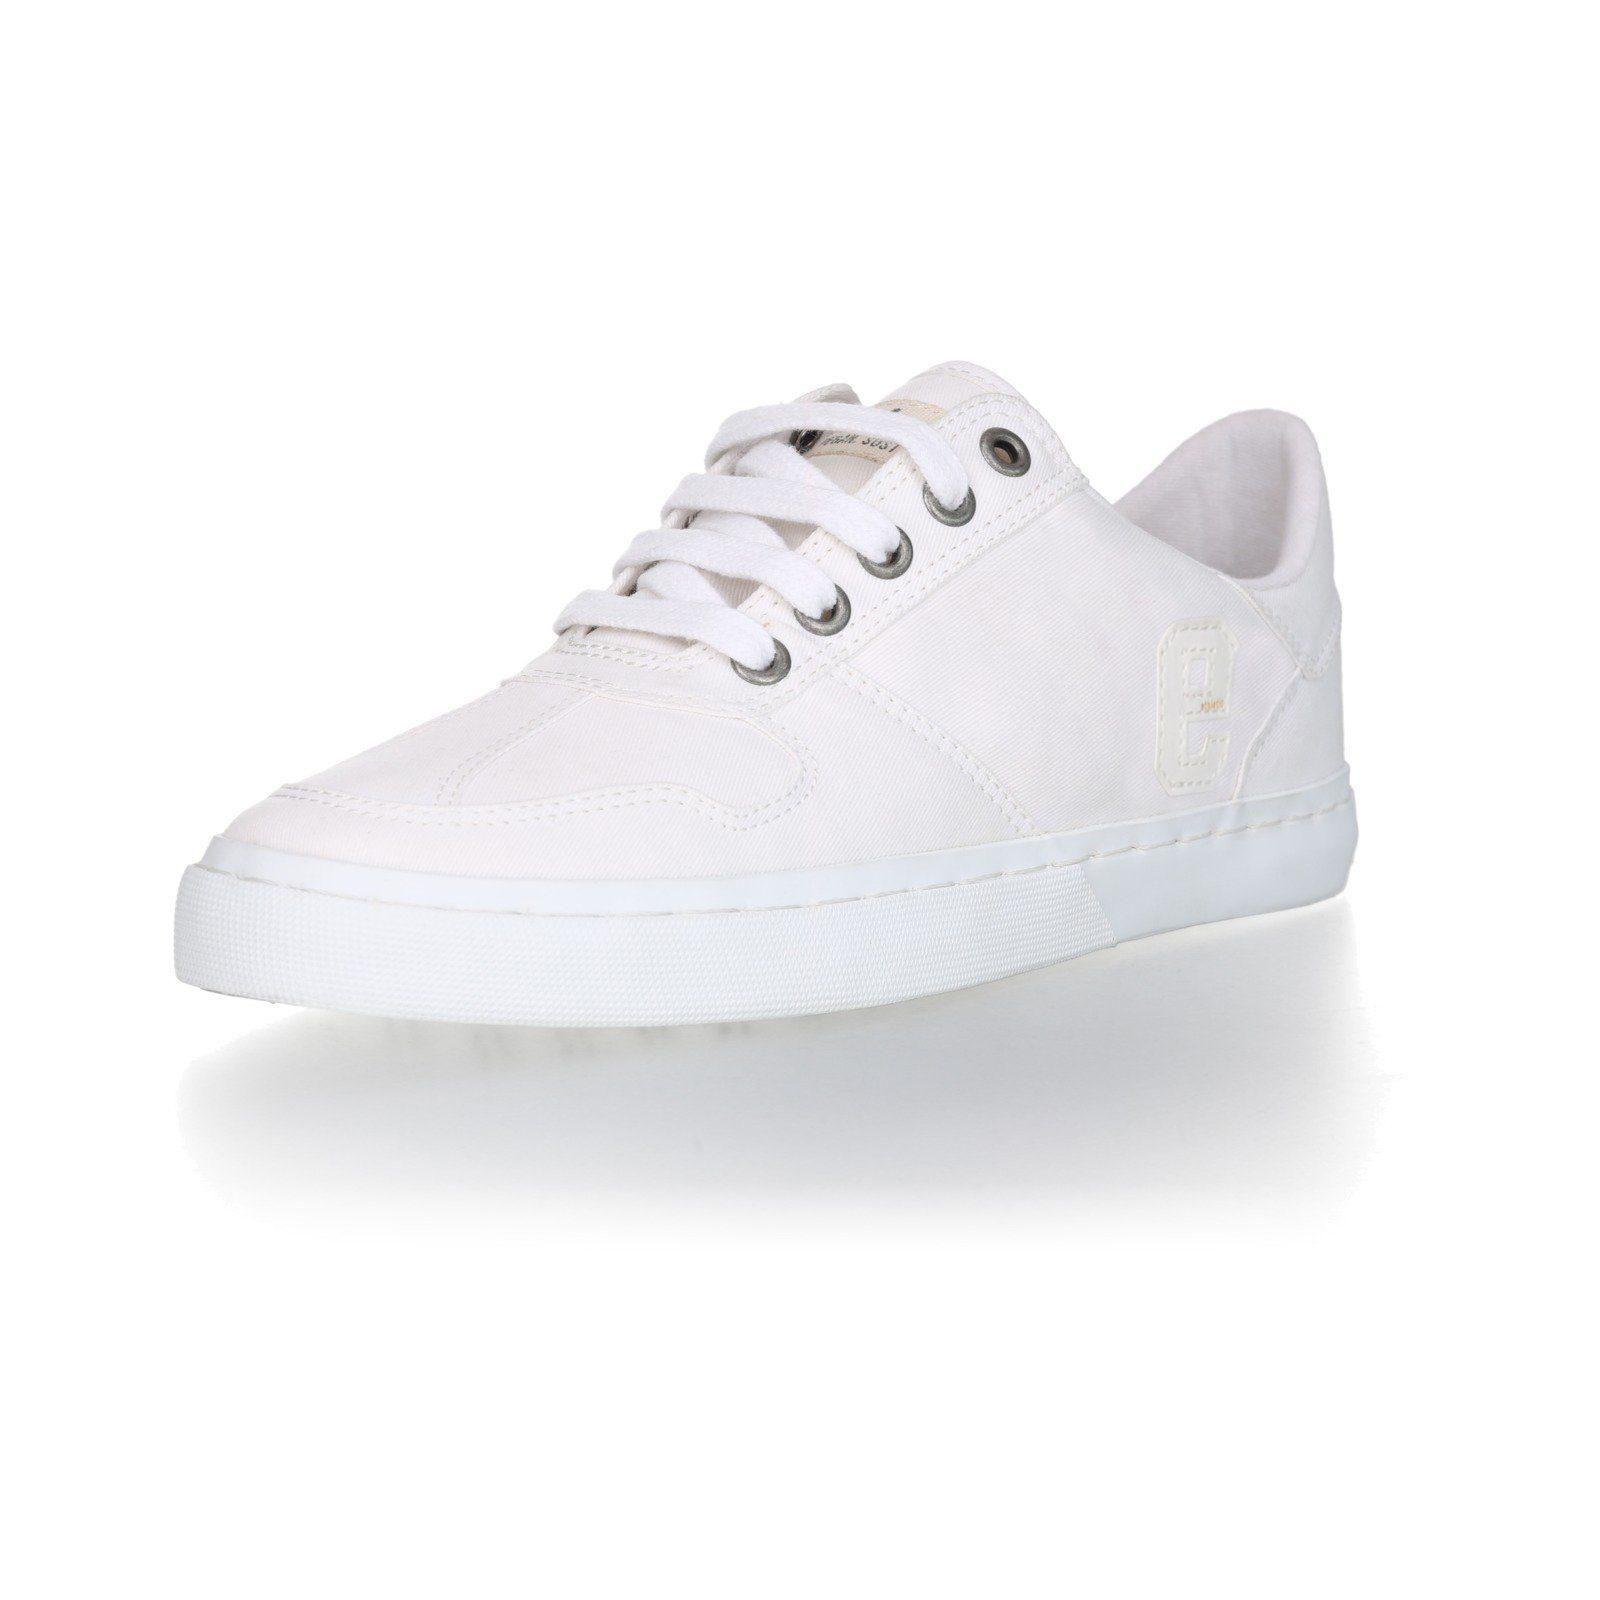 ETHLETIC Sneaker aus fairen Bedingungen Root18  Just White